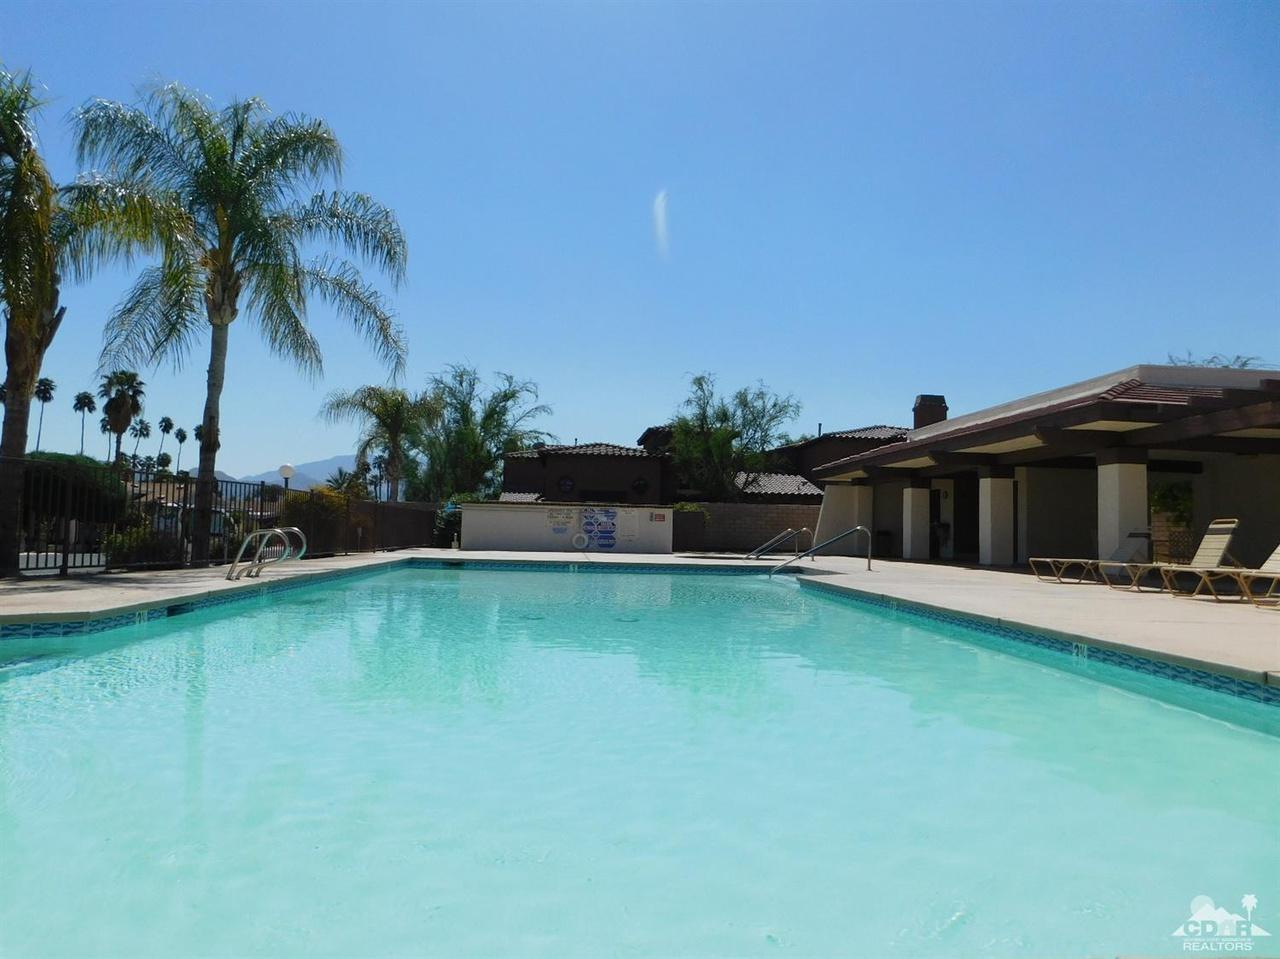 73450 Country Club Dr #314, Palm Desert, CA 92260 | MLS# 217021618 ...